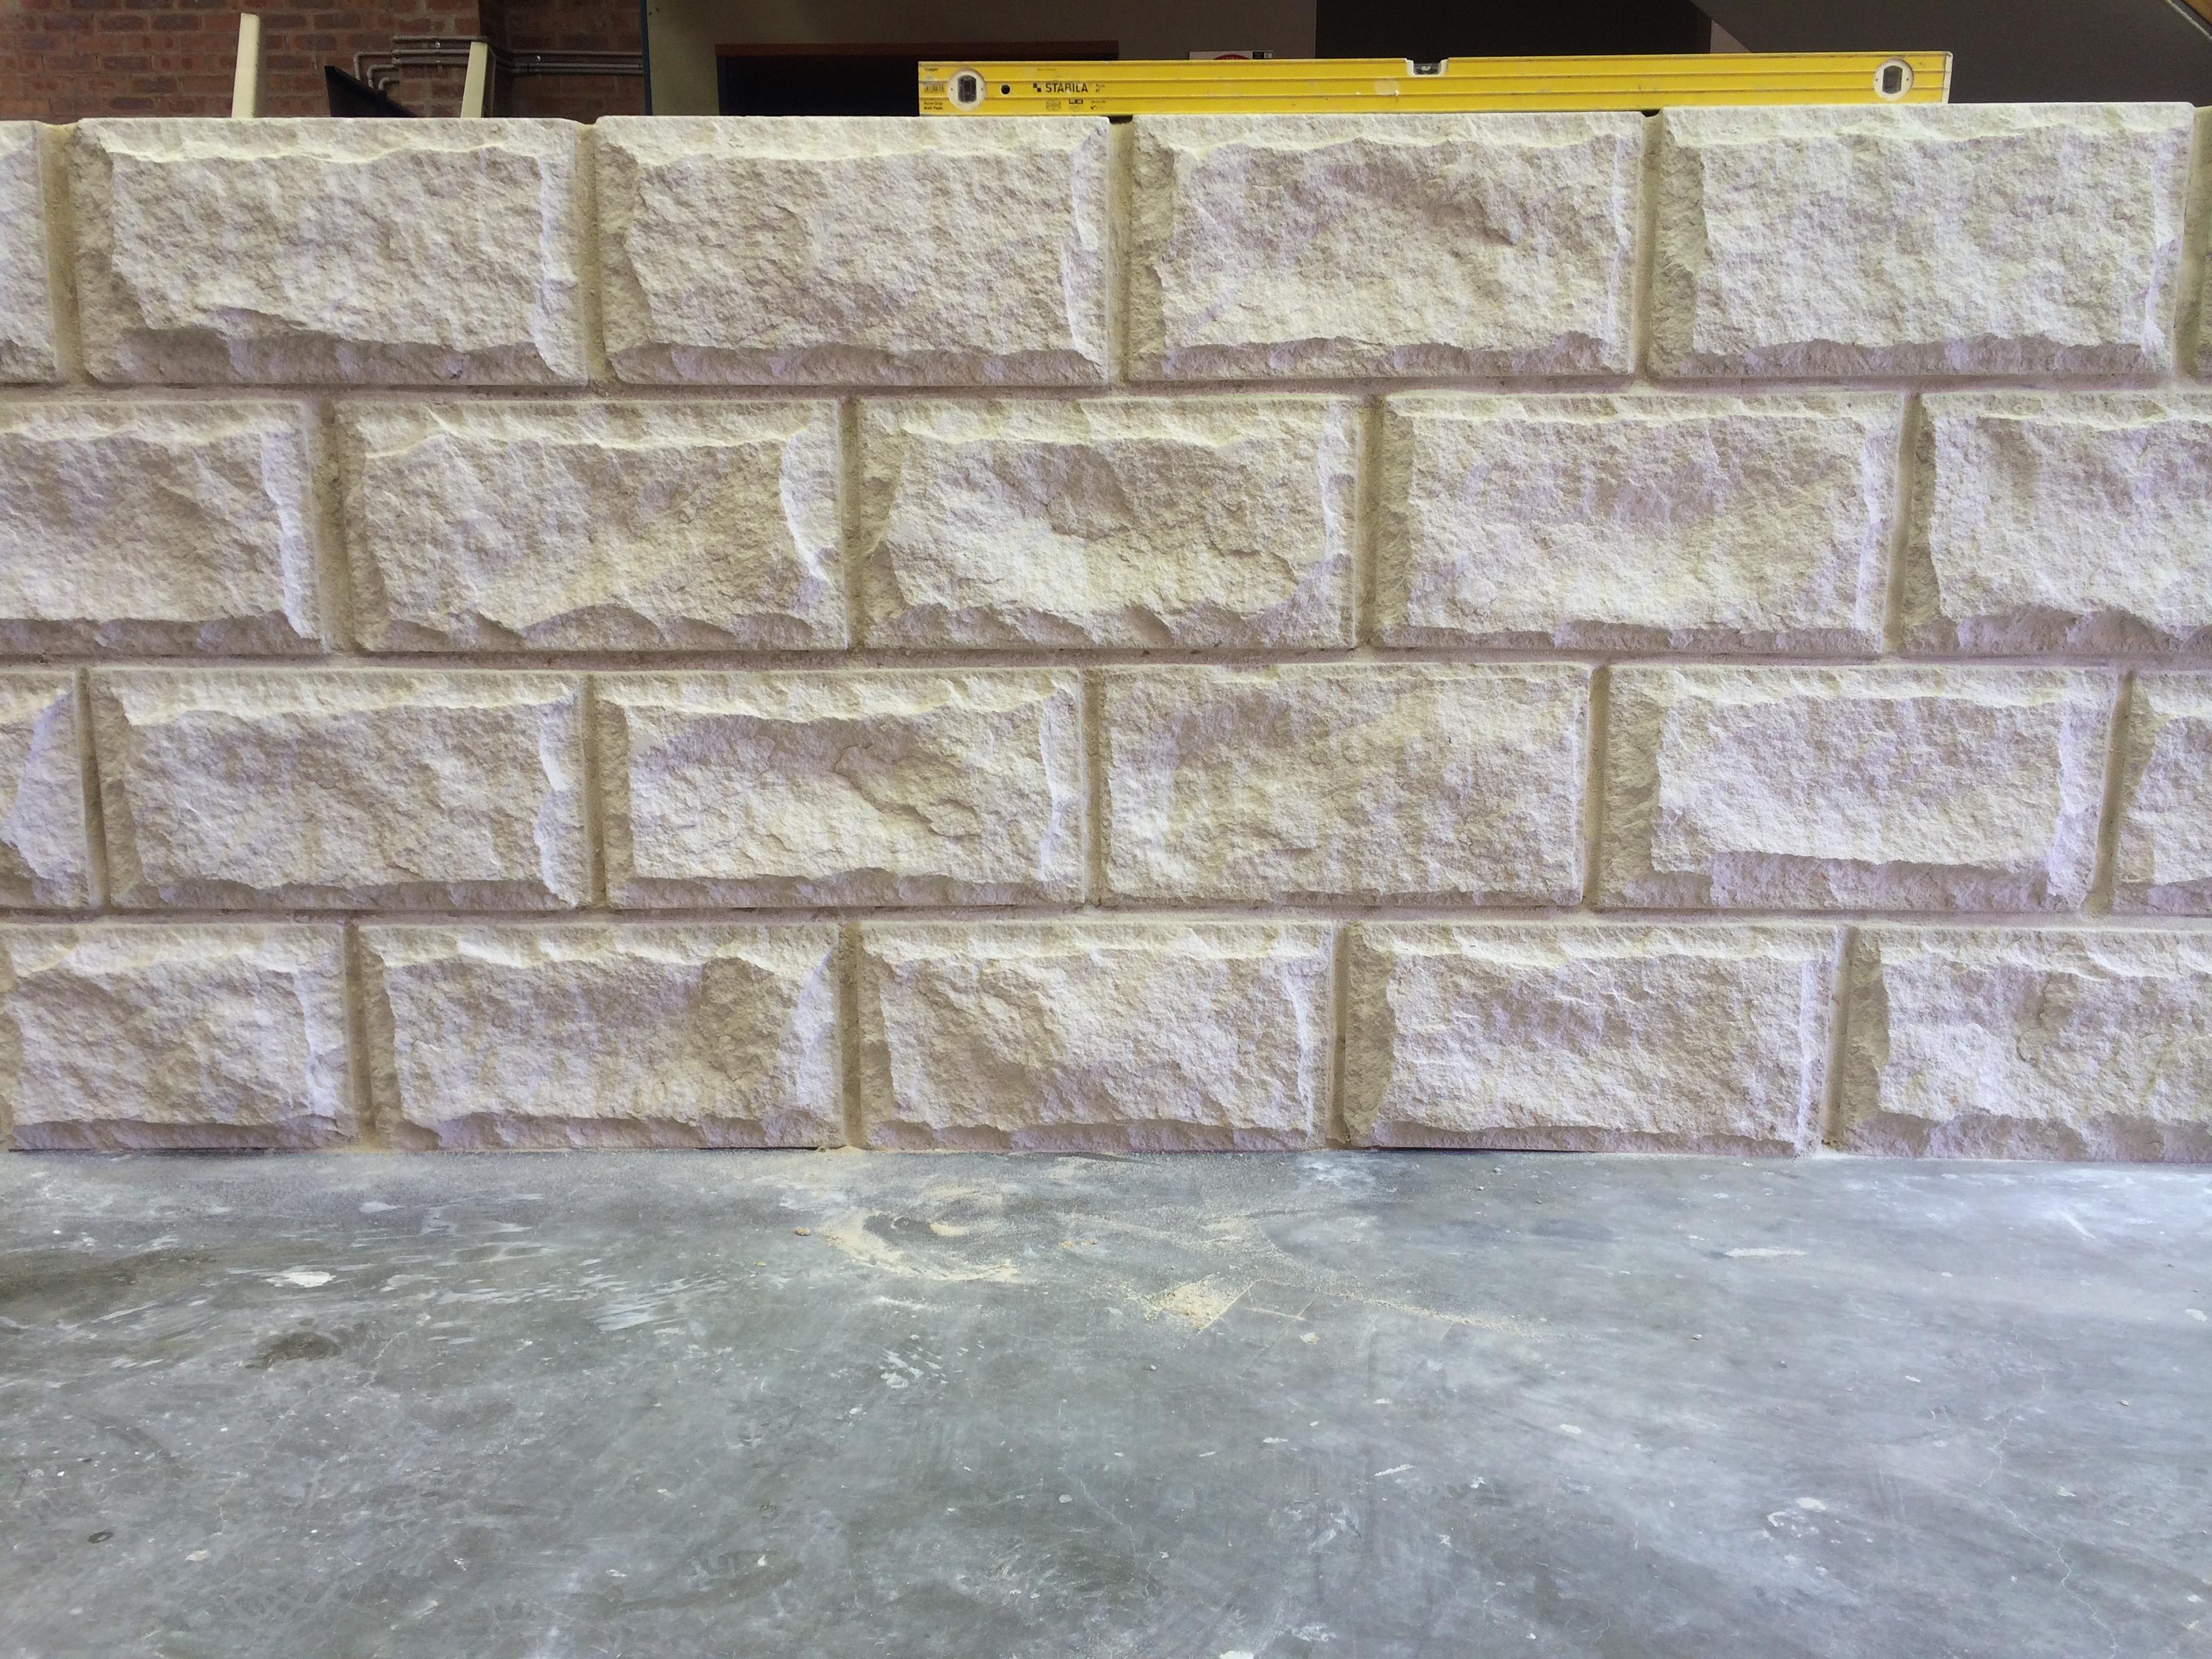 Stone wall using Rockface white sandstone cladding, stack stone